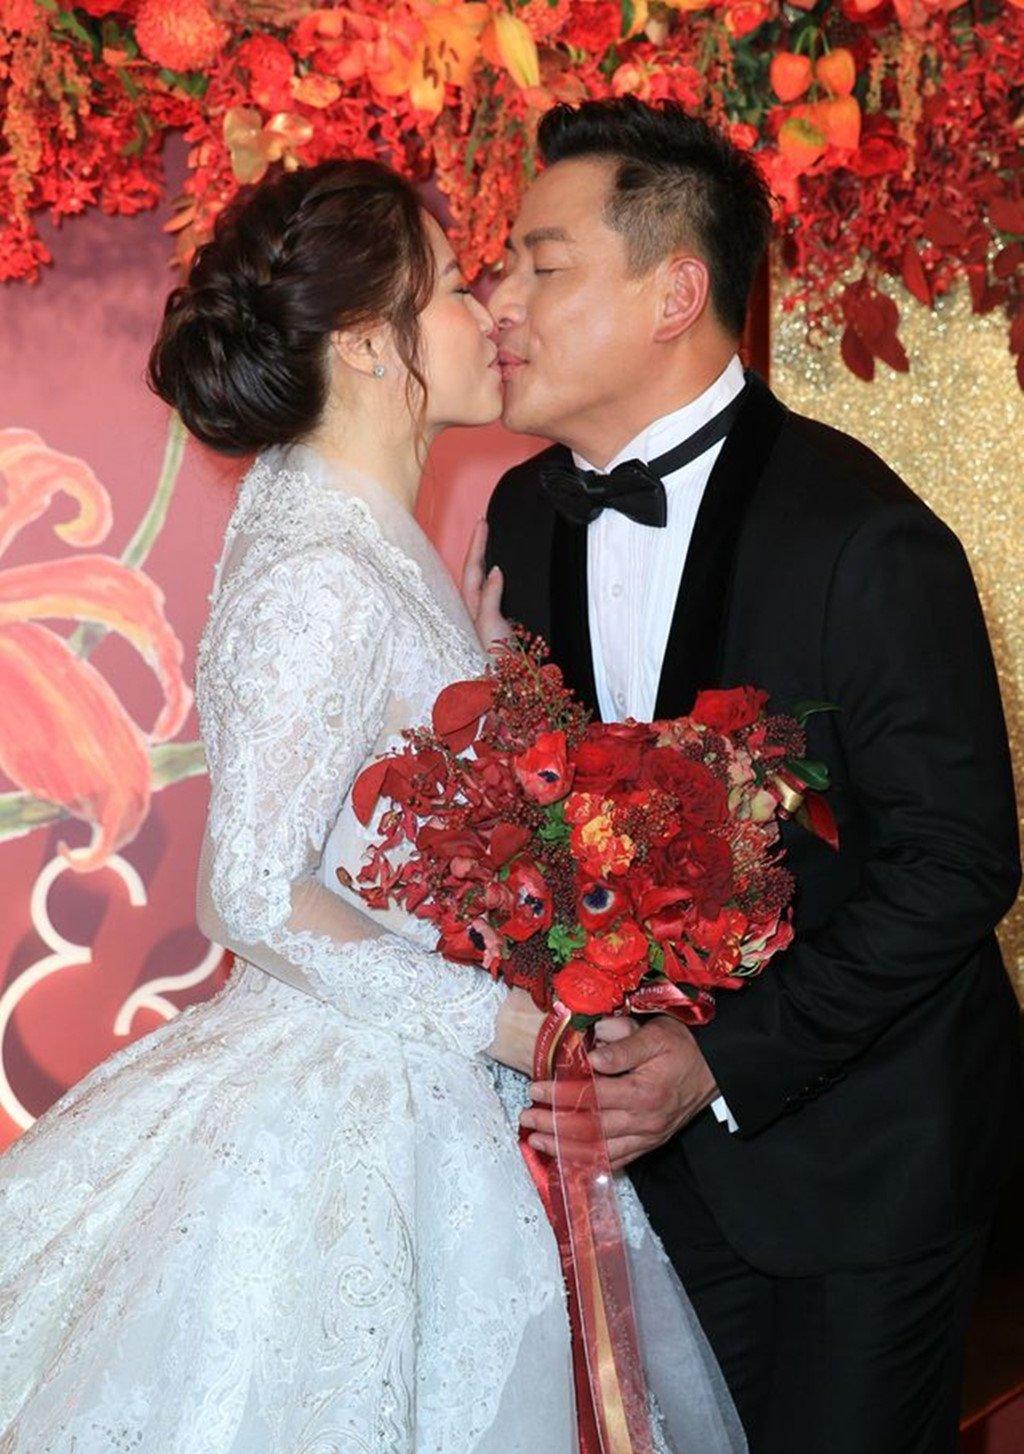 Le cuoi tai tu 'Bao Thanh Thien' gap su co vi vay co dau bi chay hinh anh 5